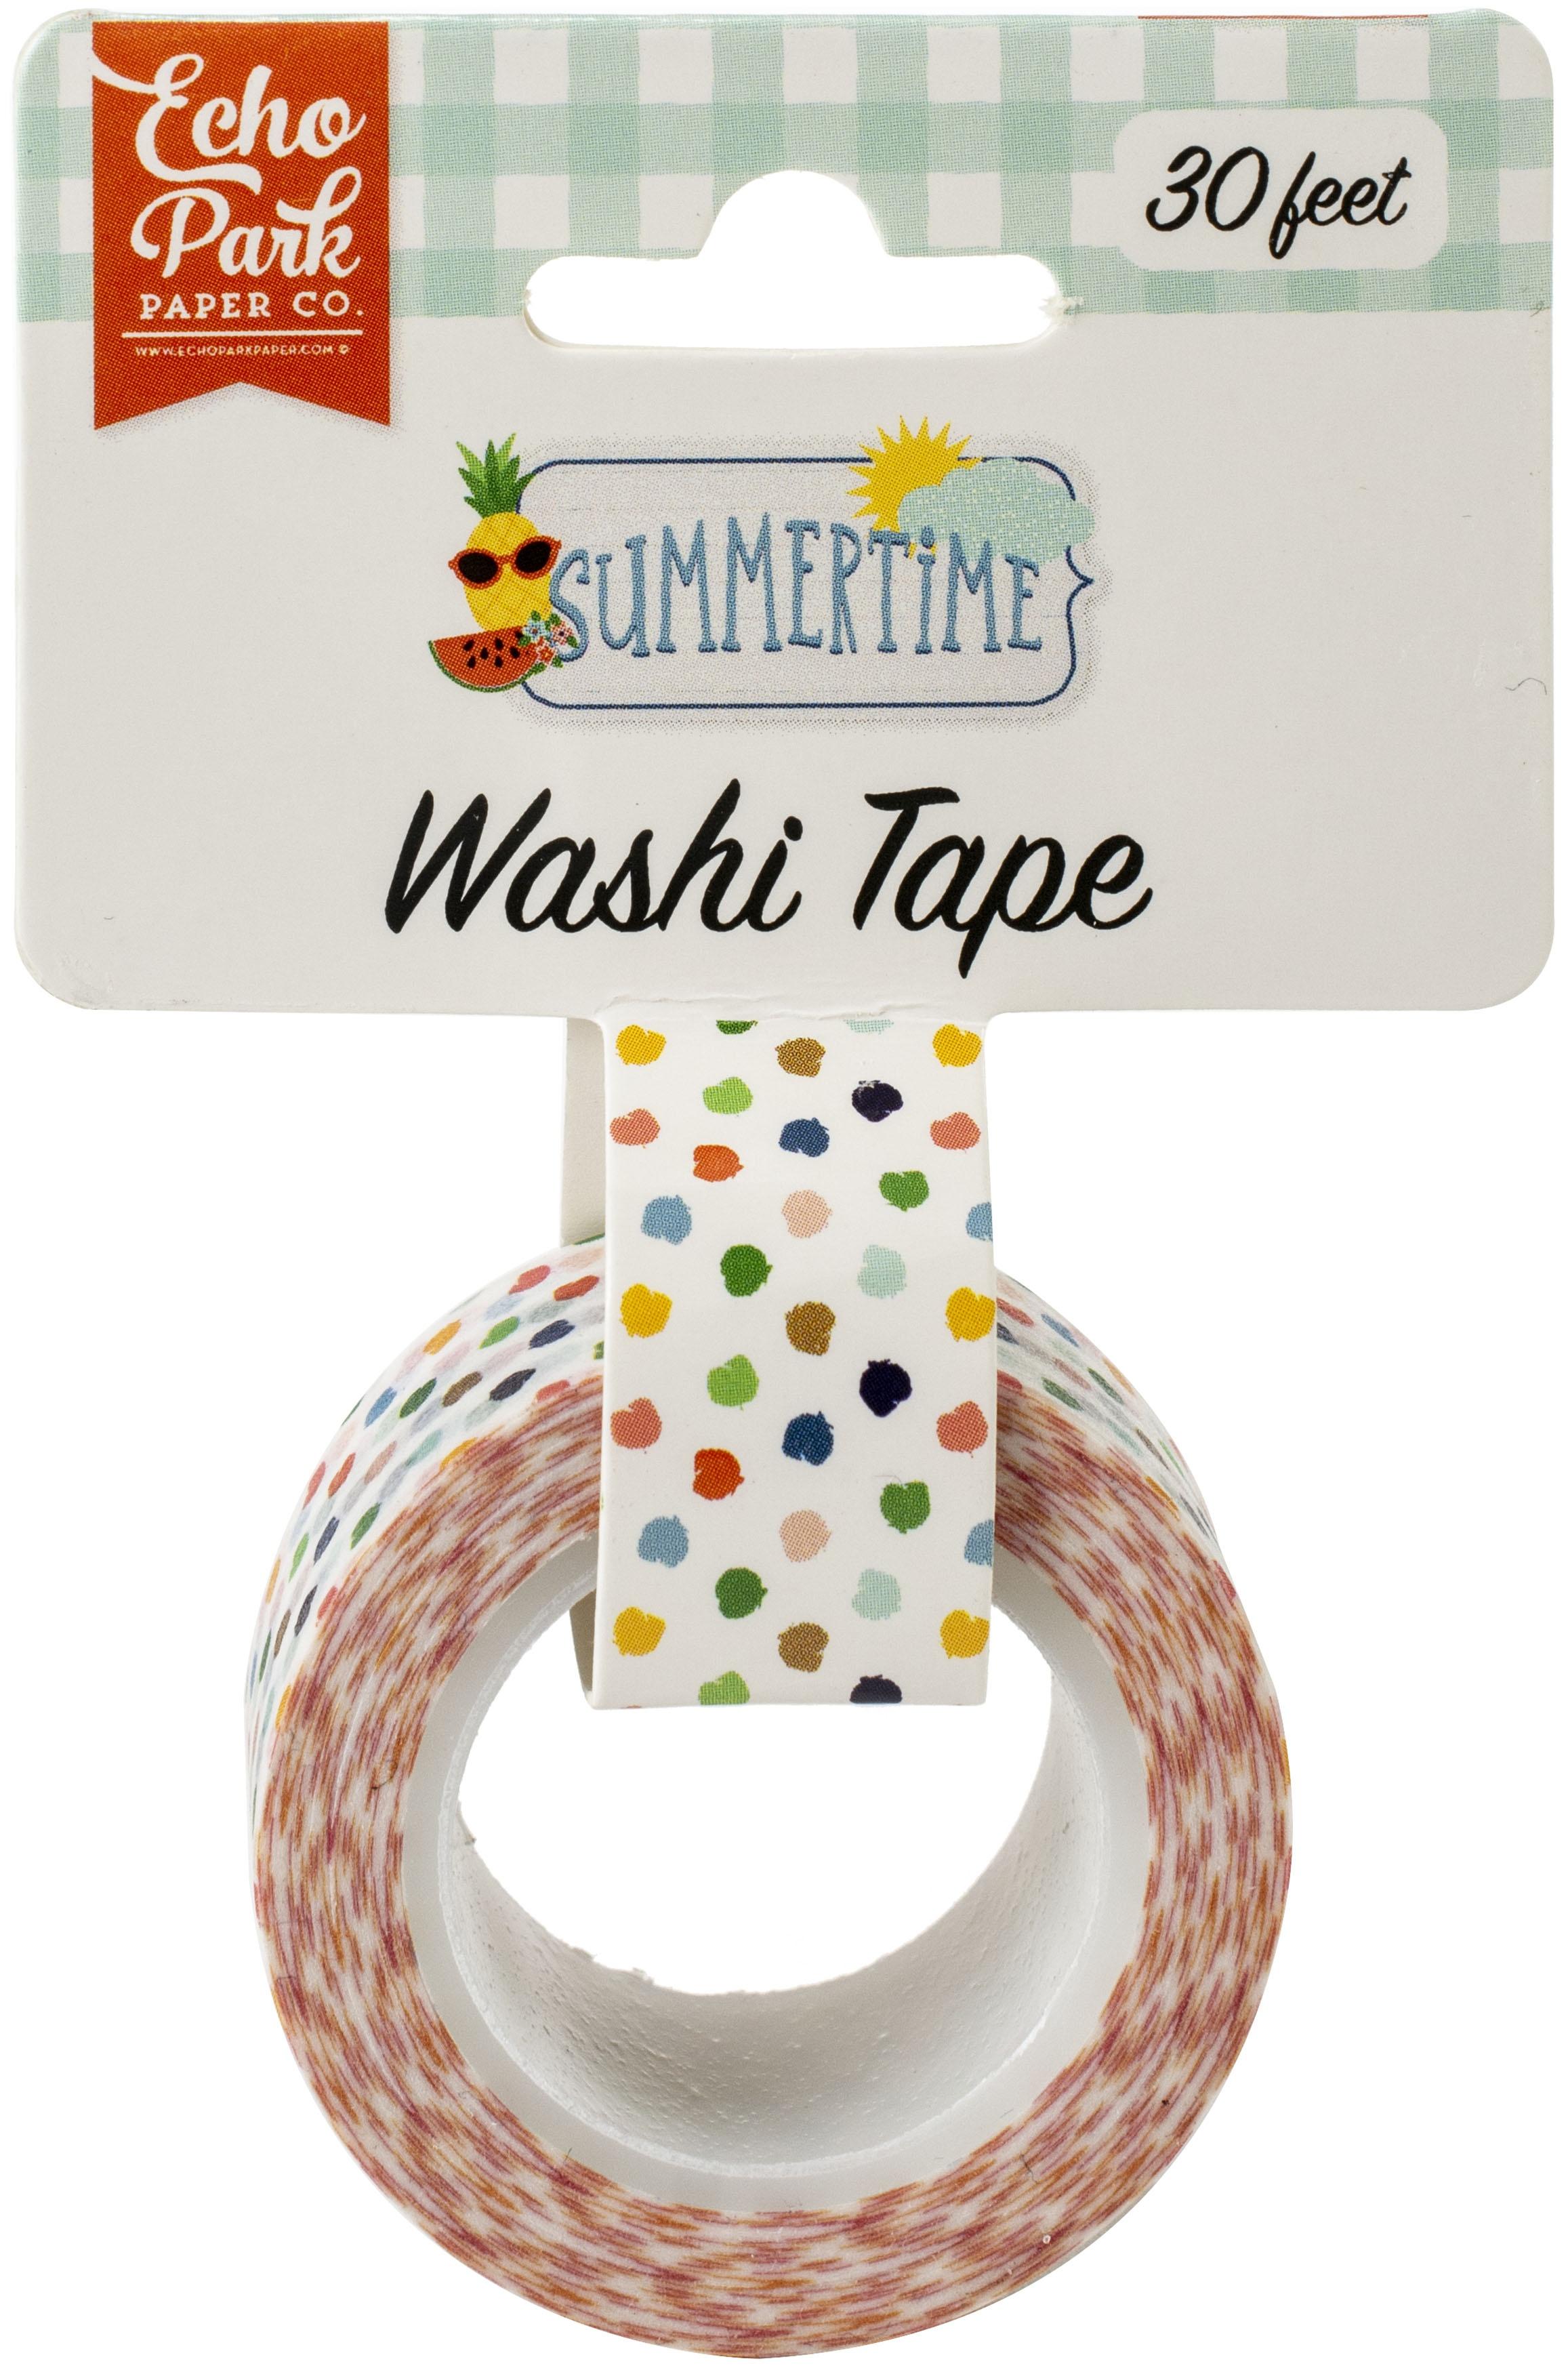 Echo Park Summertime Washi Tape 30'-Summer Dot